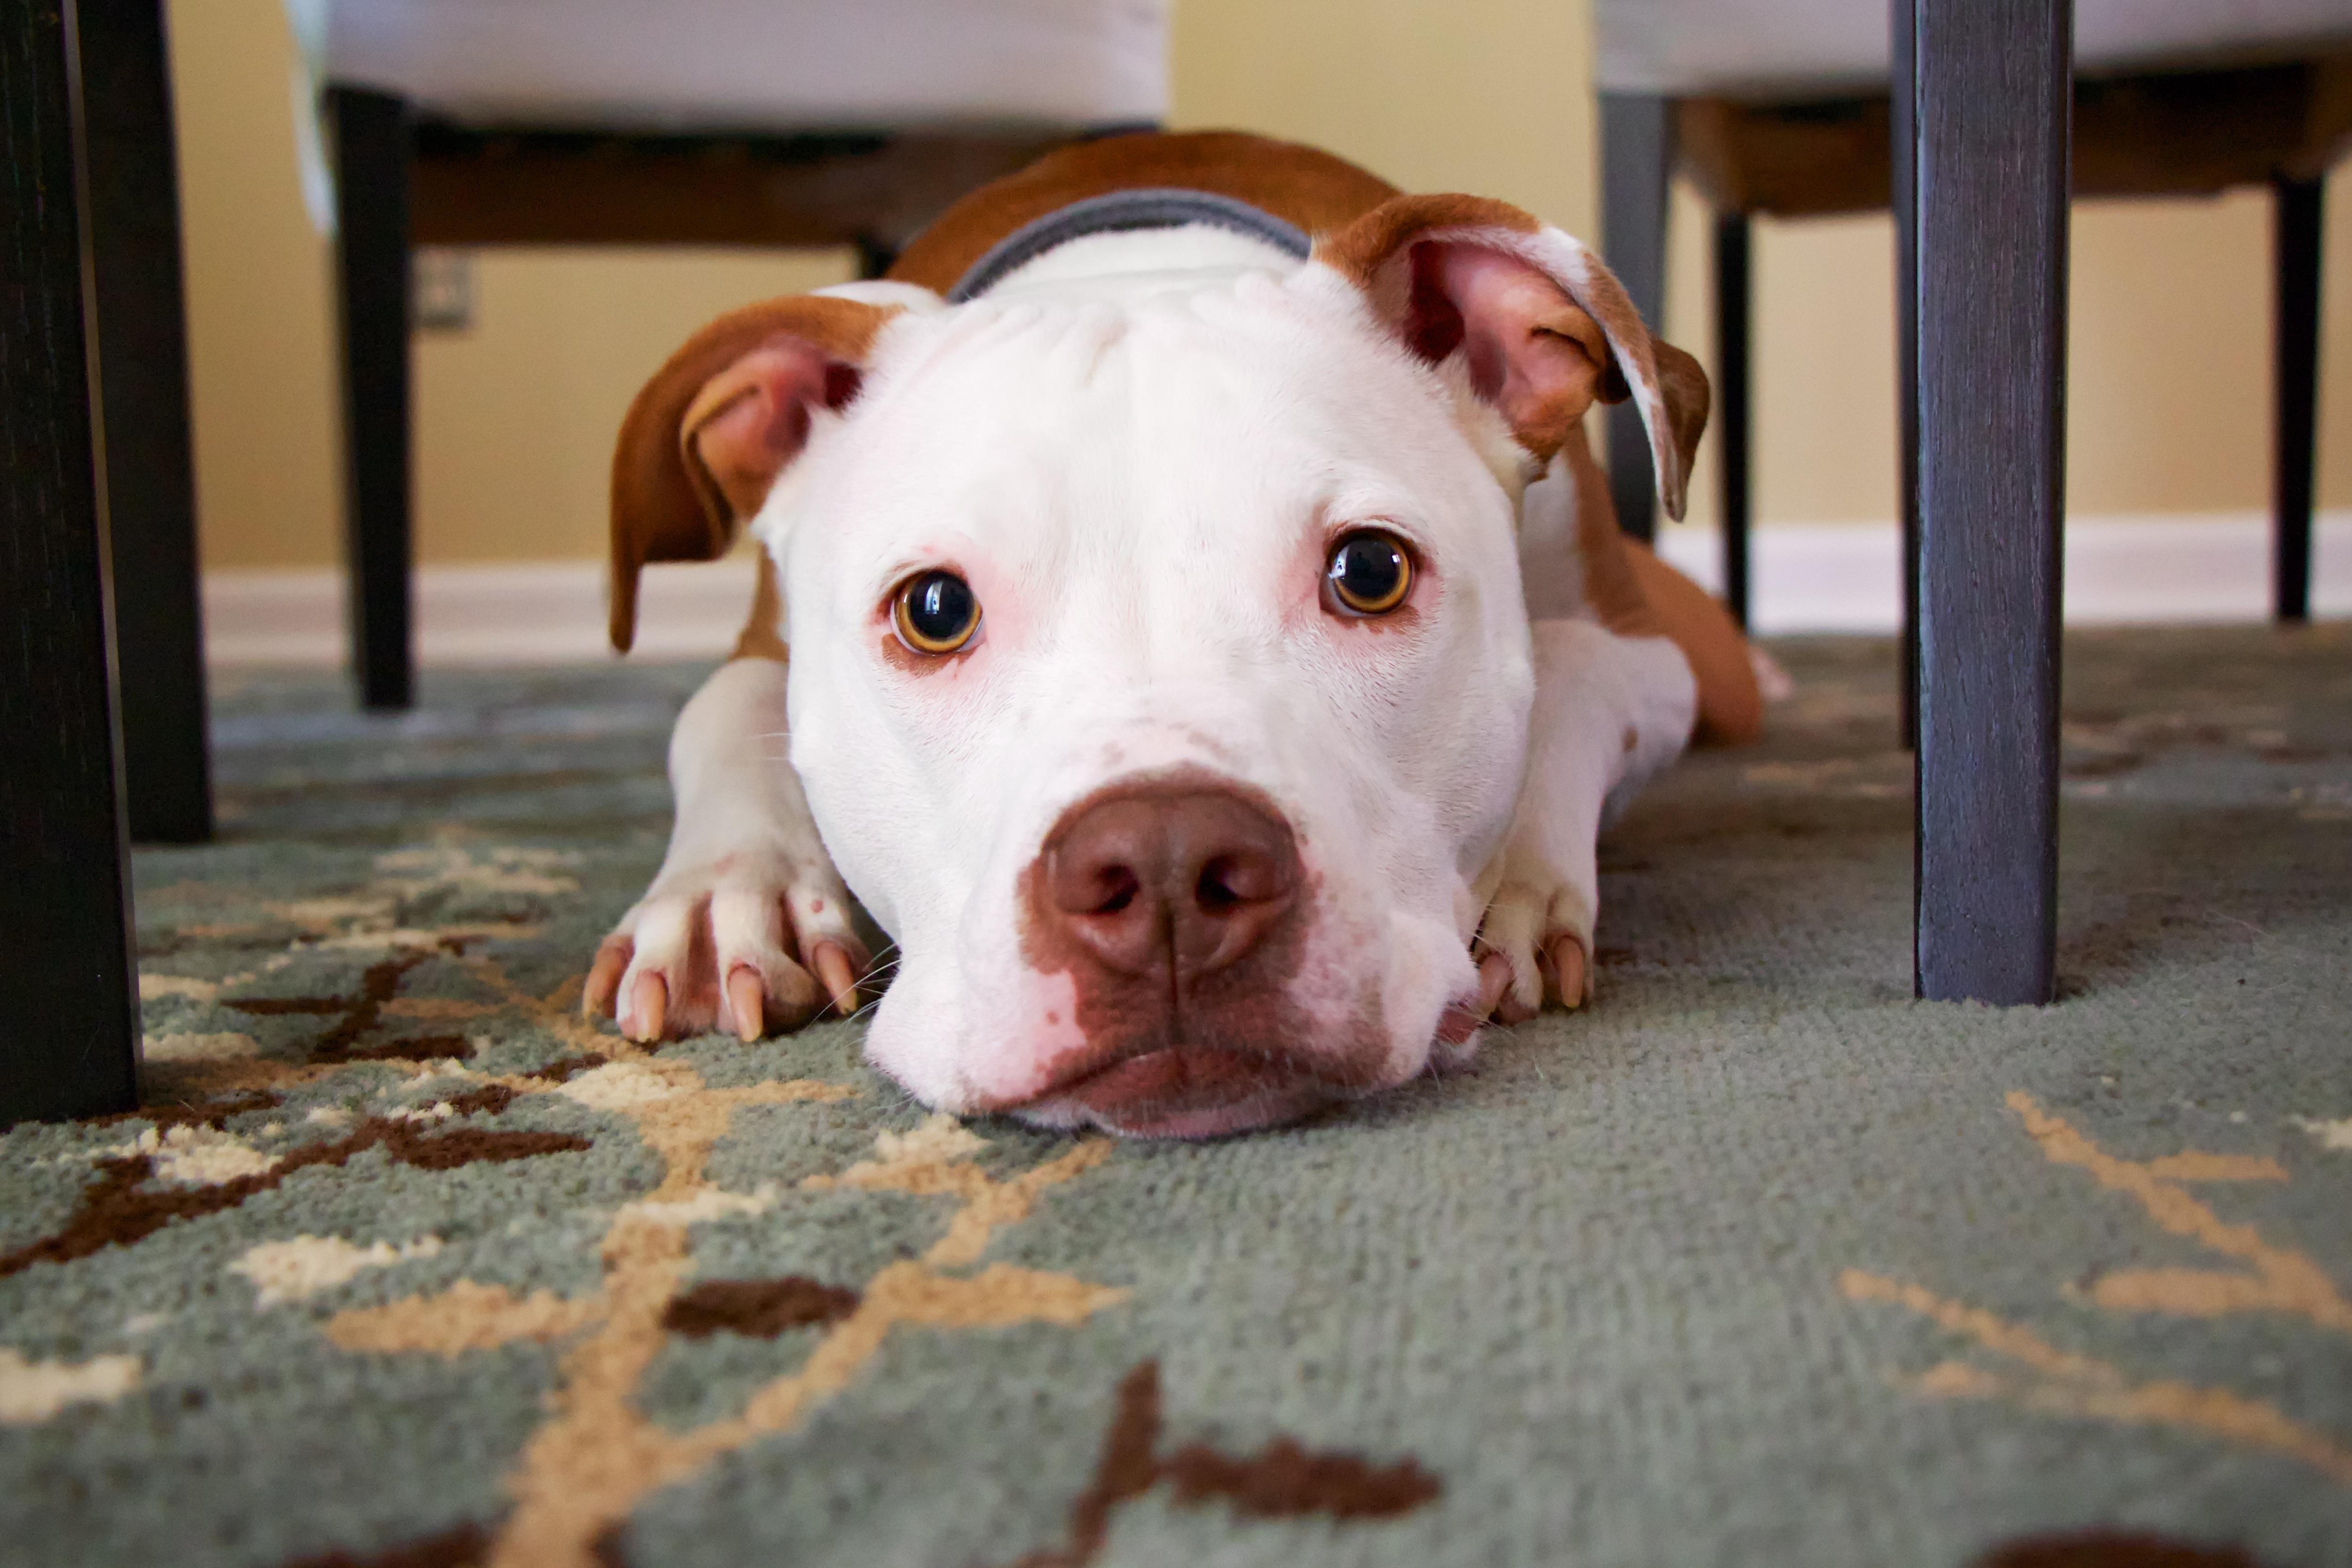 Wonderful Bulldog Canine Adorable Dog - puppy-dog-cute-canine-pet-mammal-bulldog-face-look-vertebrate-adorable-terrier-pit-bull-concentration-tenderness-dog-like-mammal-american-pit-bull-terrier-1038034  Image_229743  .jpg